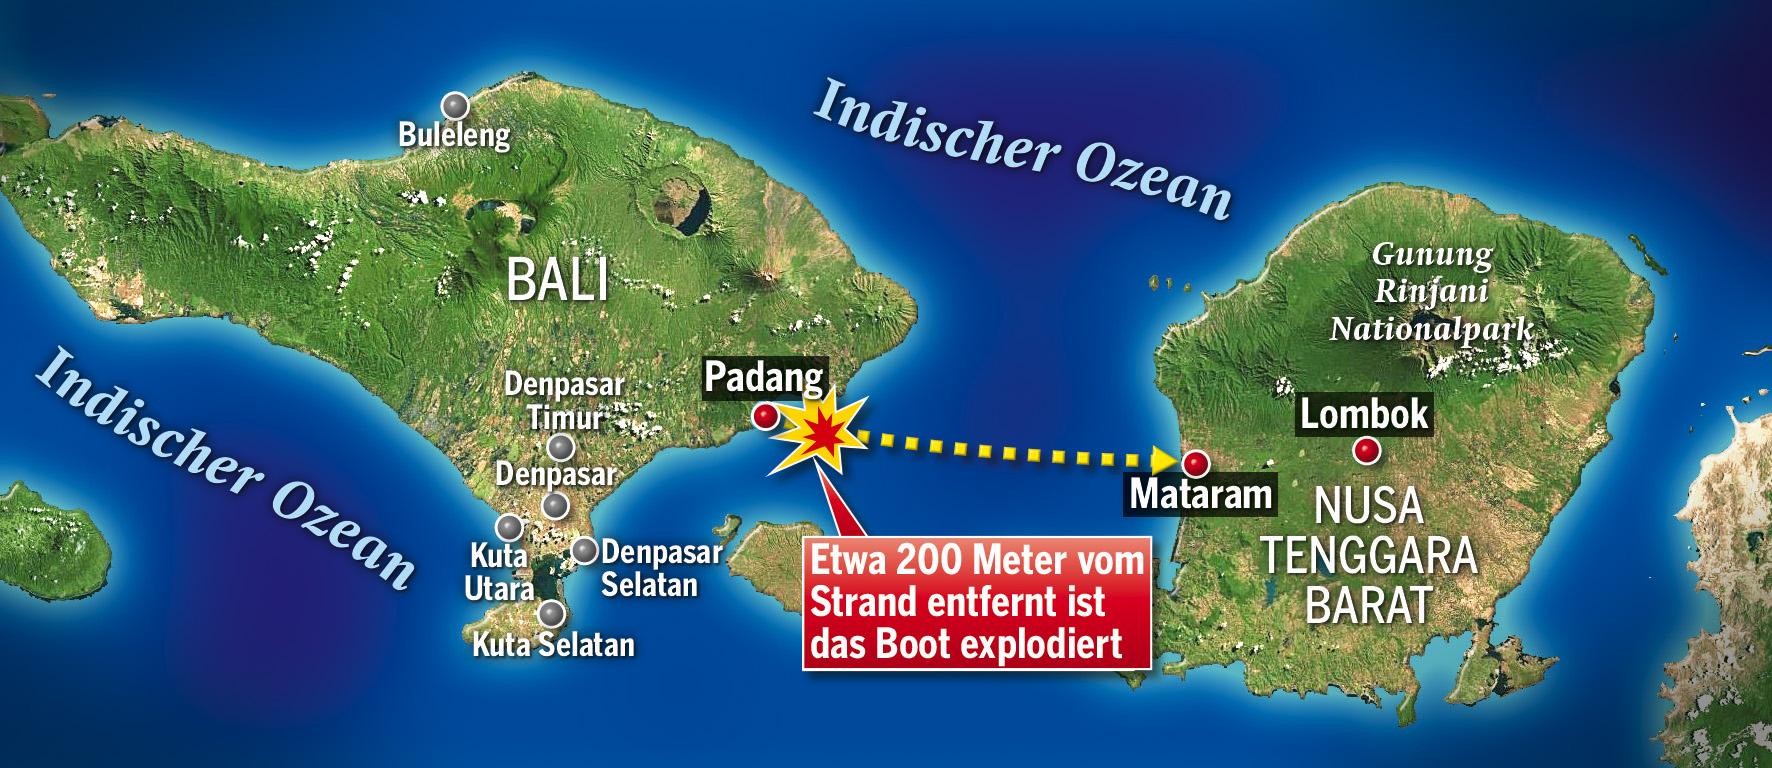 160916_Bali_Unglueck.jpg